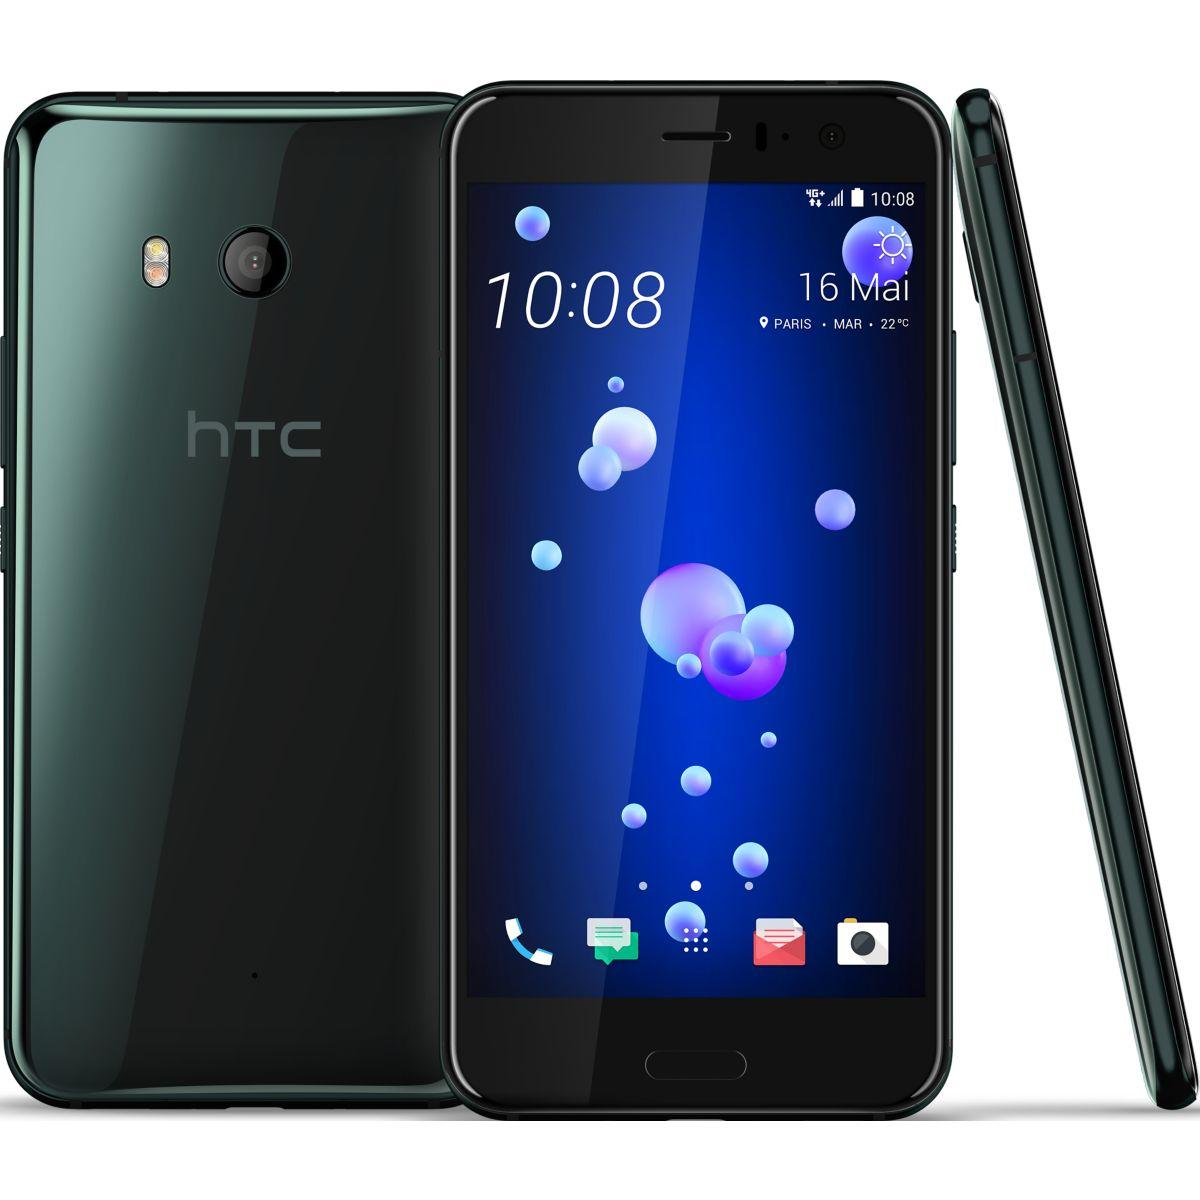 Smartphone htc u11 noir 64 go - 3% de remise immédiate avec le code : multi3